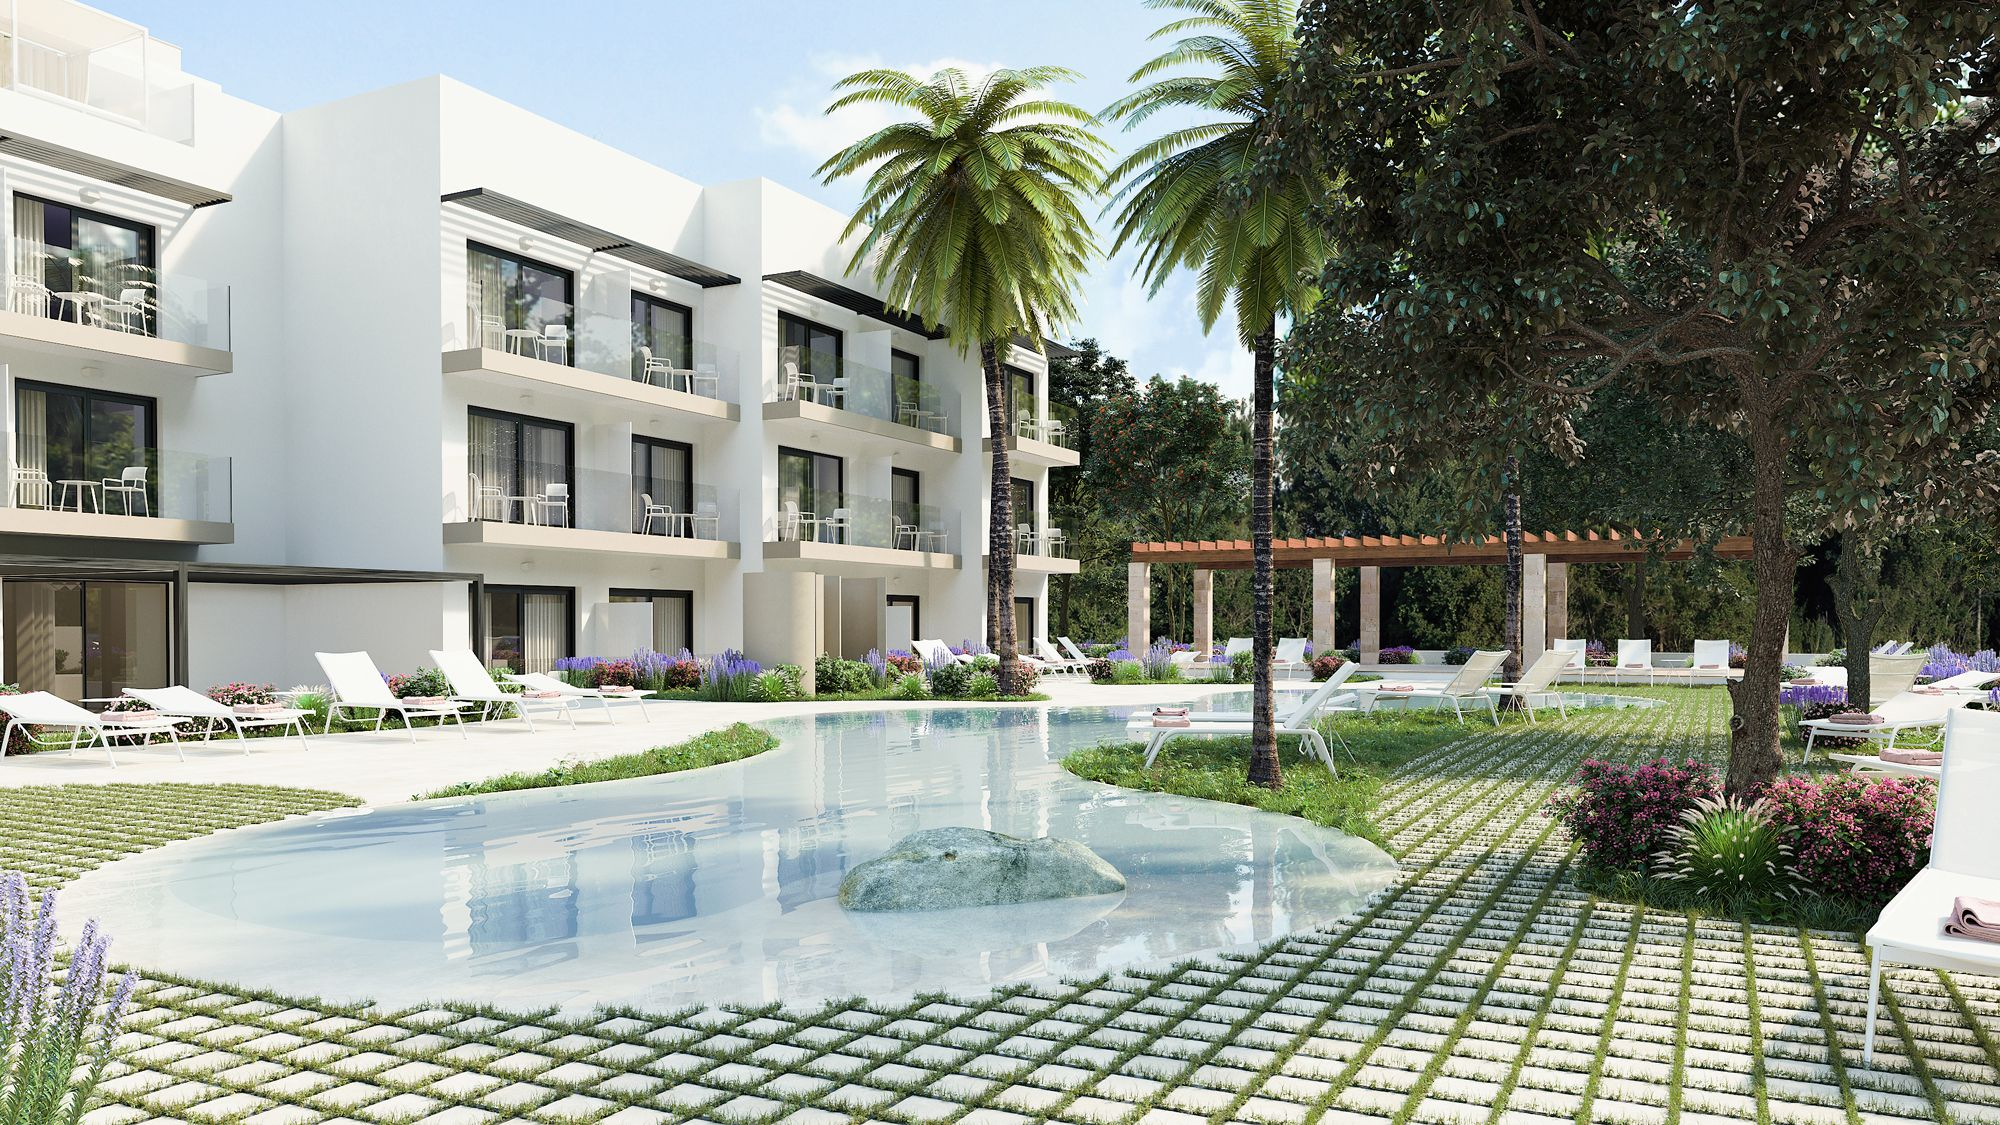 HOTEL SOM DONA Women Only Hotel +14 en Porto Cristo, Manacor, Mallorca